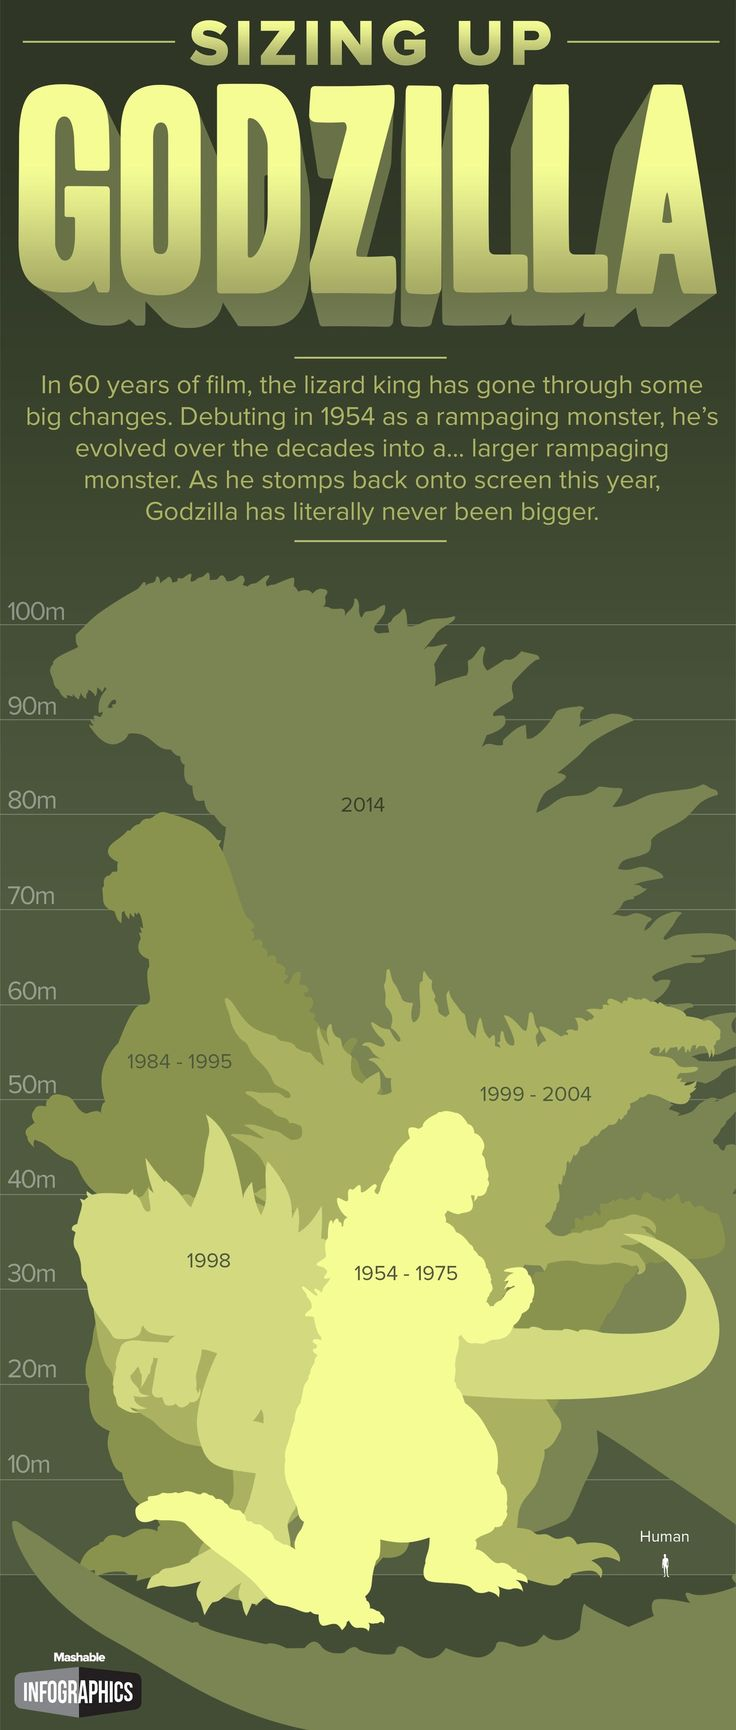 Sizing Up Godzilla. Now even bigger!!